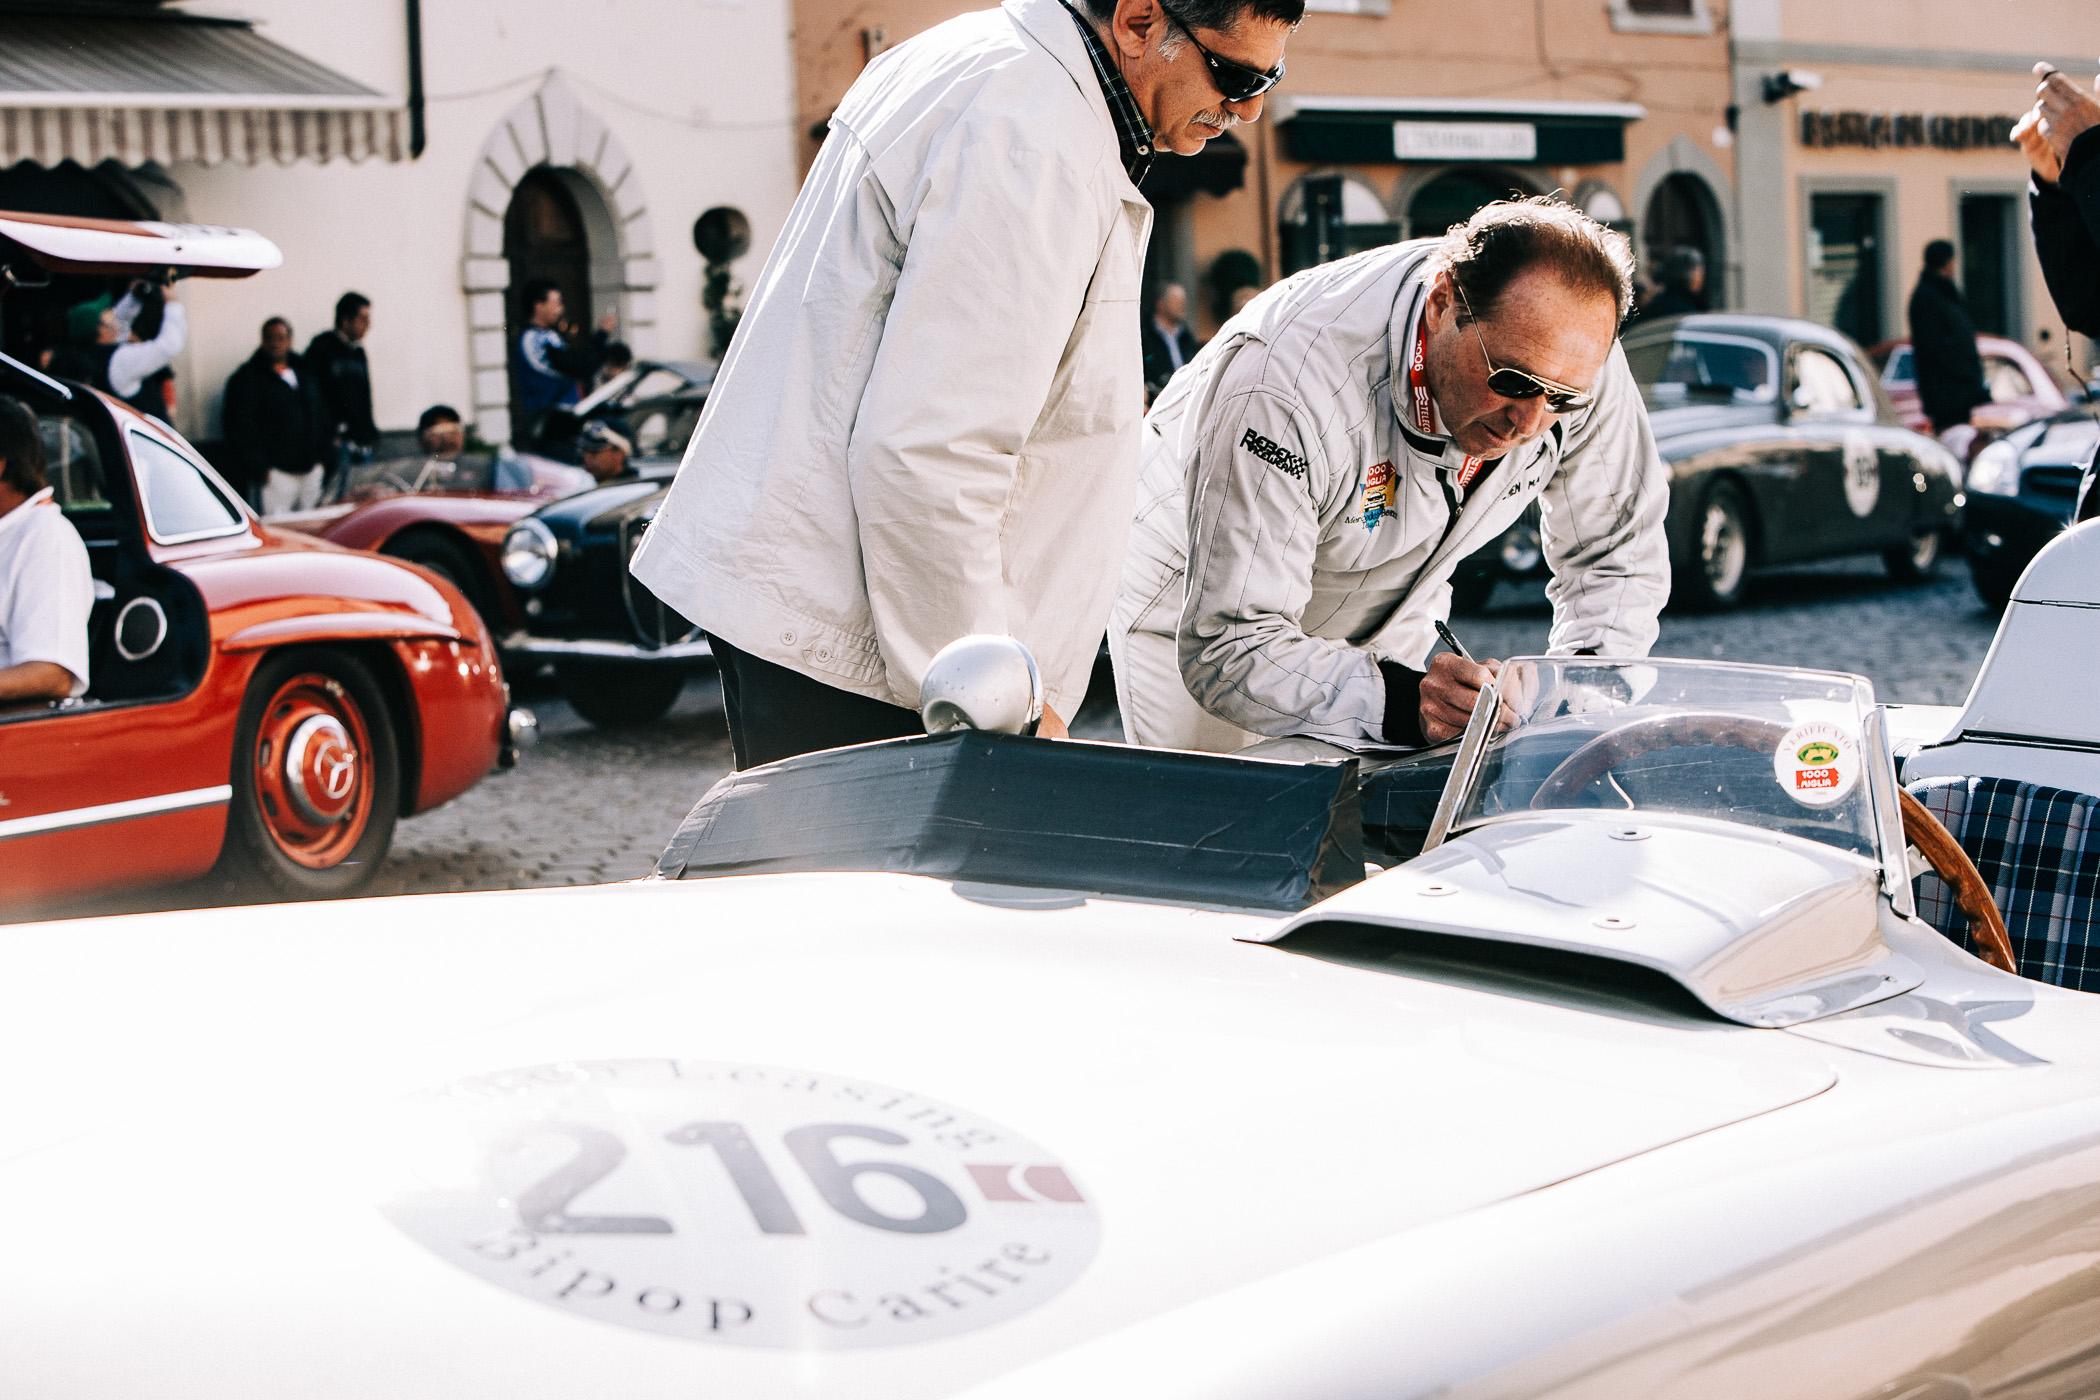 Mille Miglia, Florian Kresse, Jochen Maas, Legend, Rennlegende, Rennfahrer, Mercedes, Silberpfeil, Mercedes-Benz 300SLR